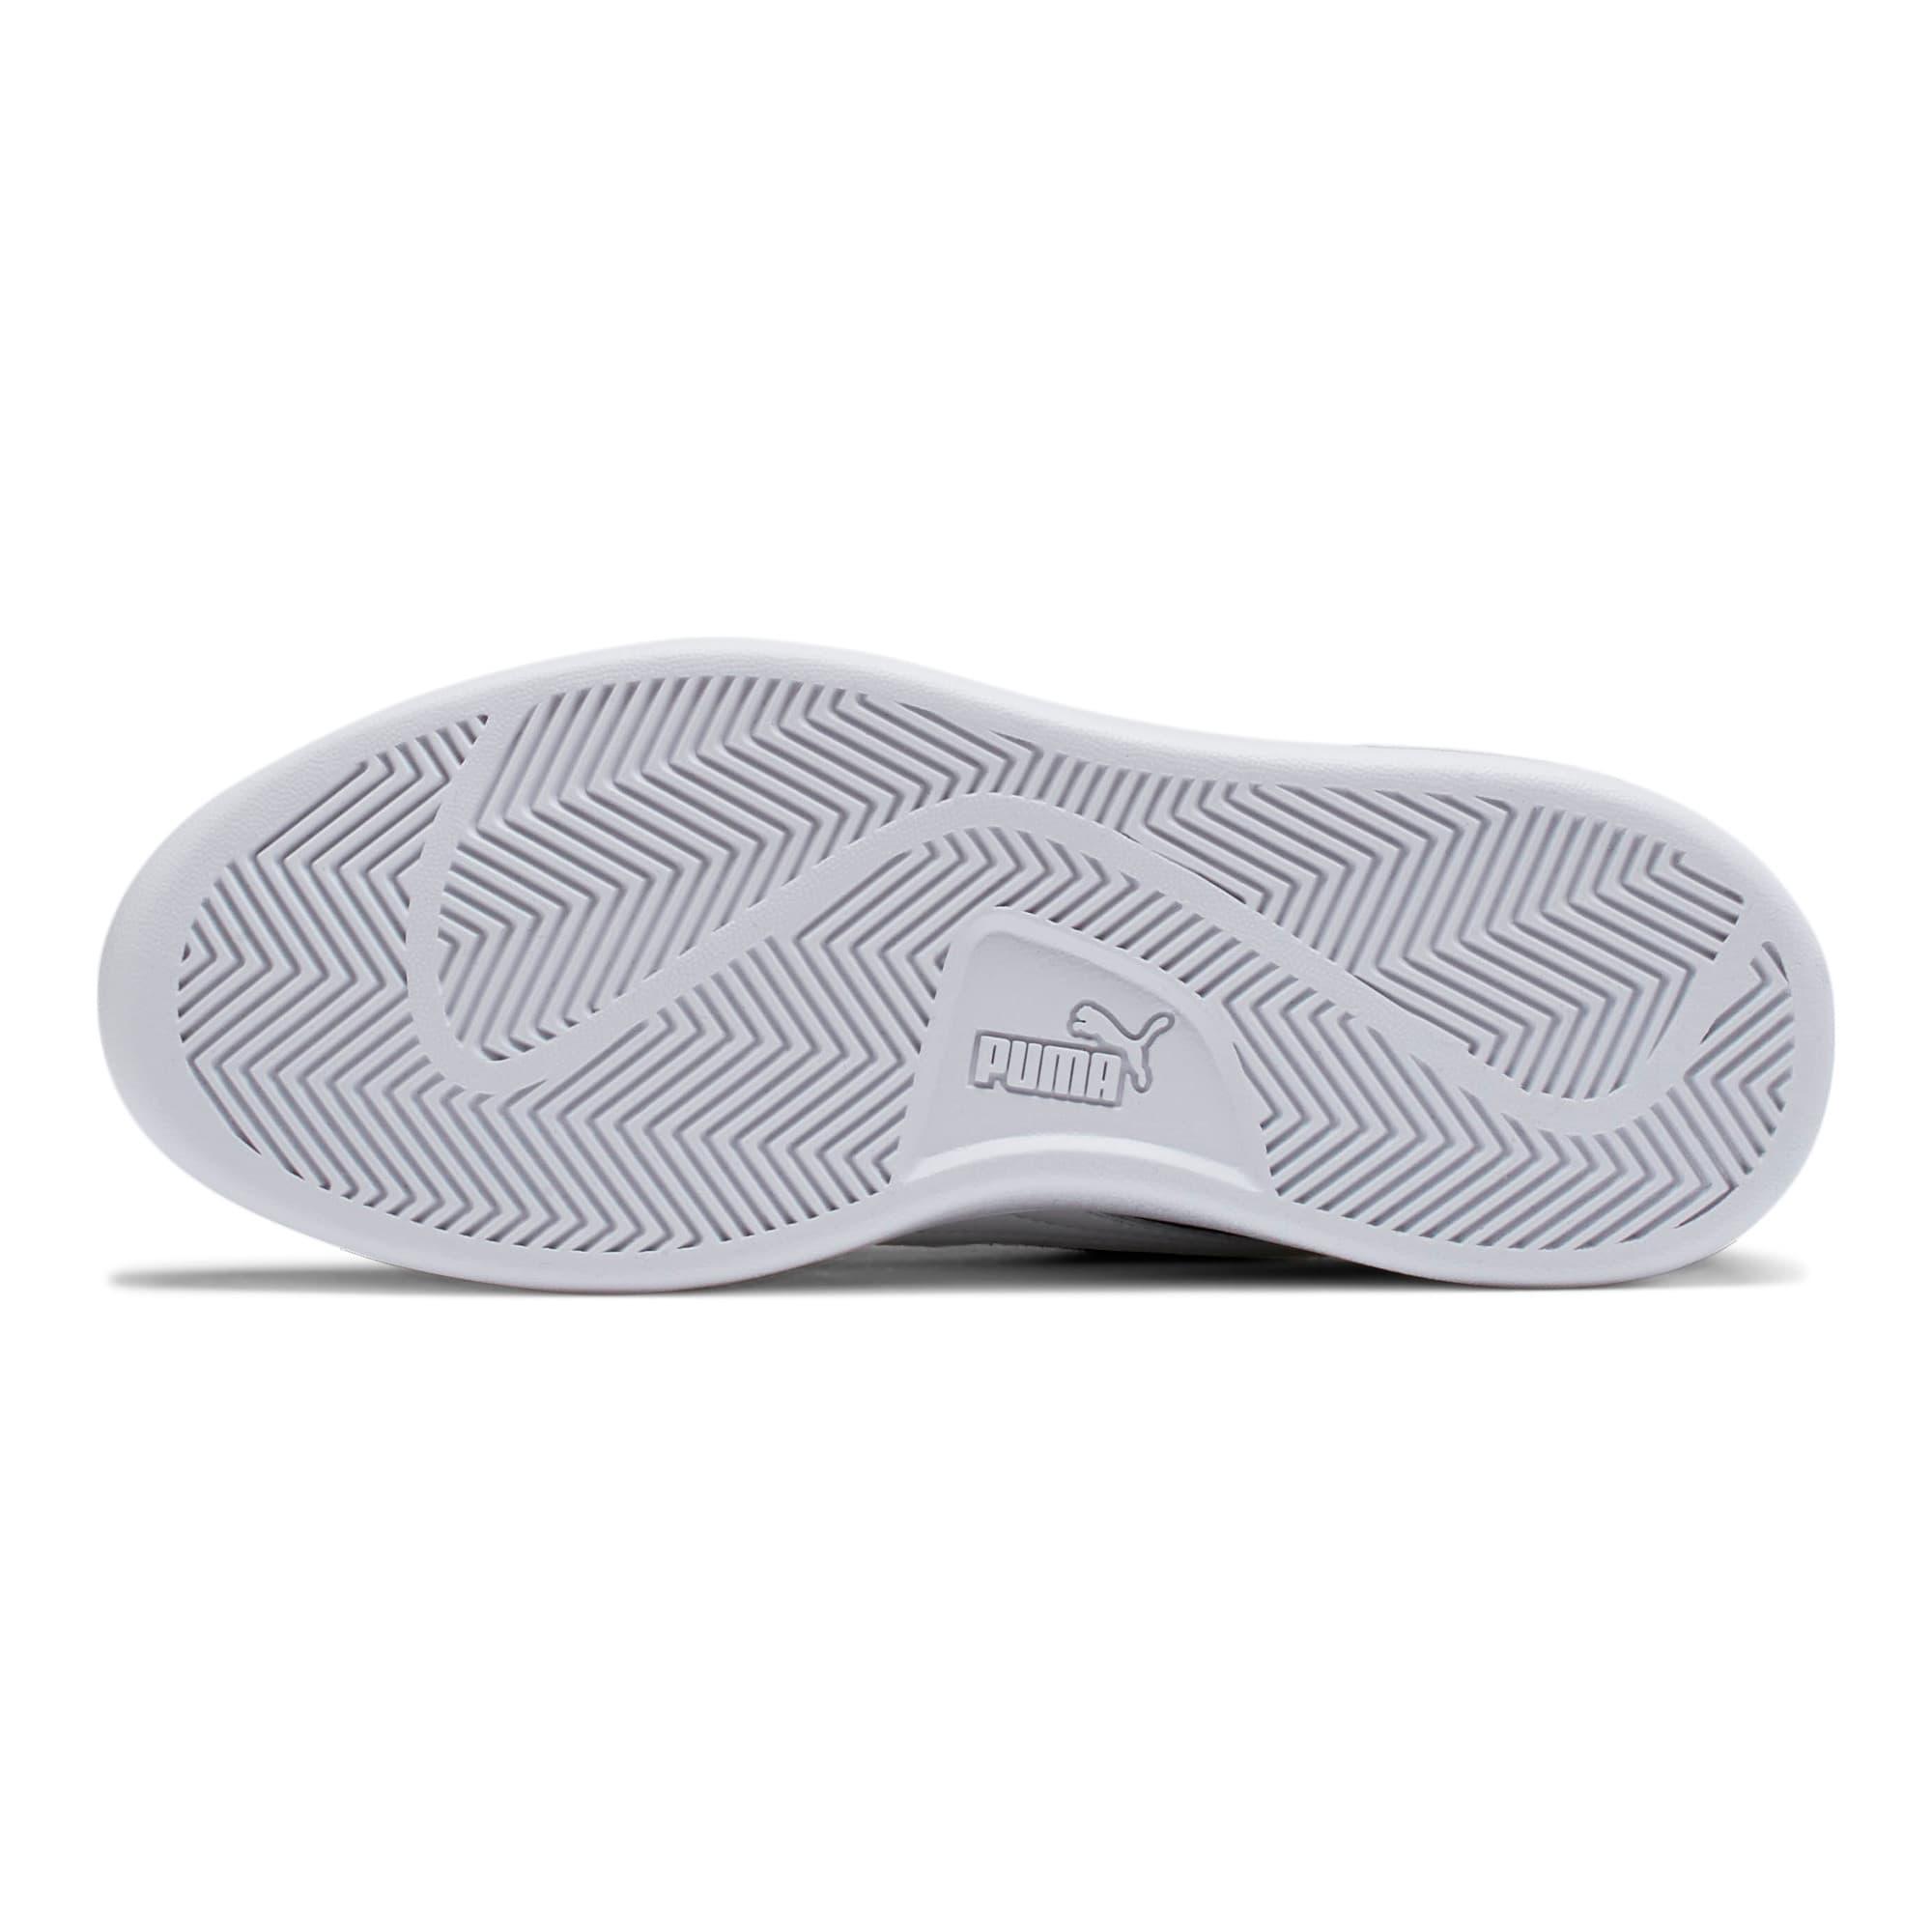 Thumbnail 3 of Smash v2 Suede Sneakers JR, Peacoat-Puma White, medium